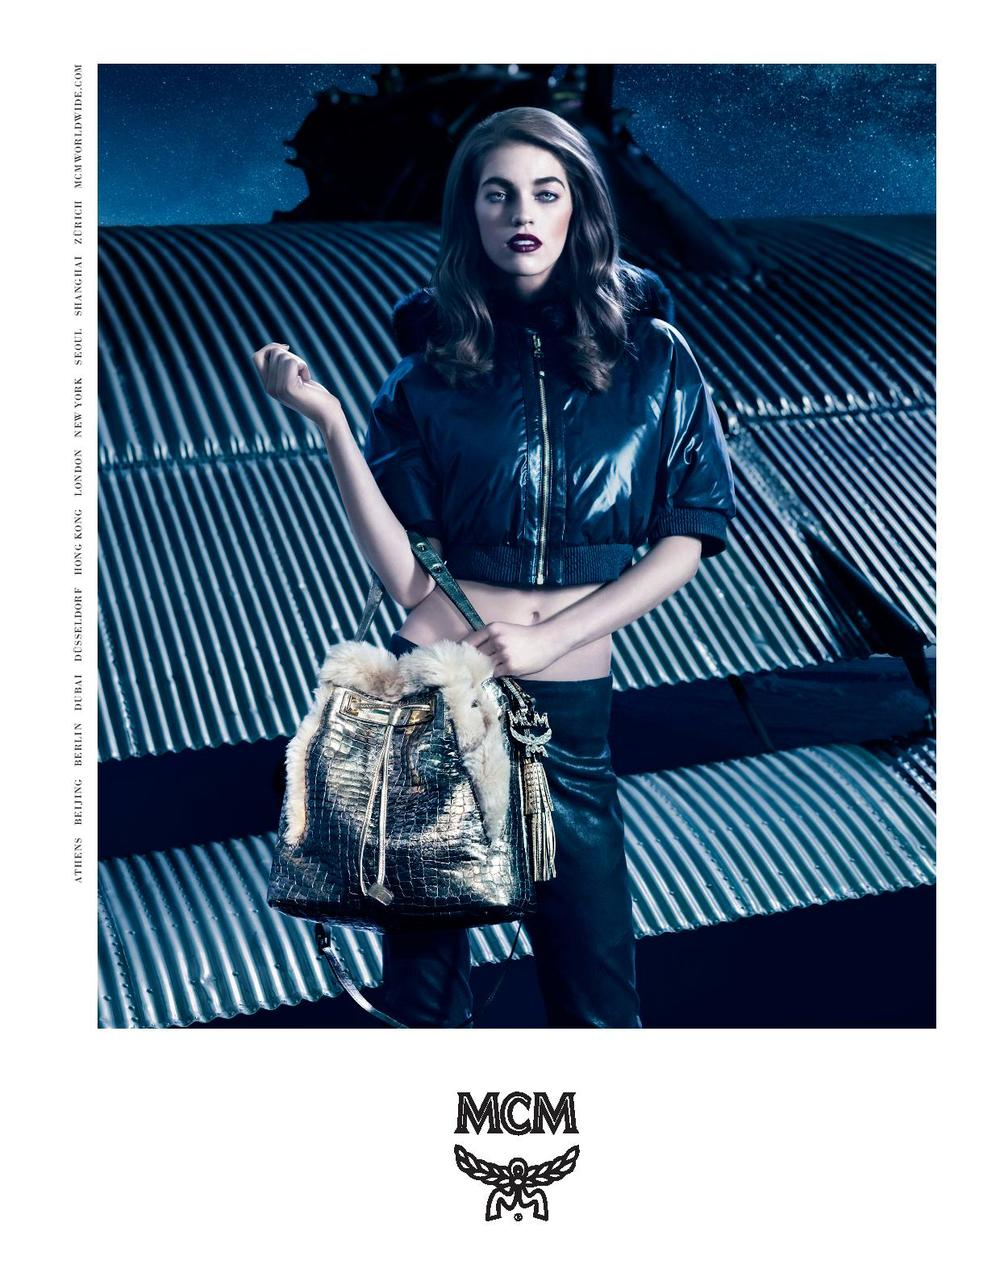 MCM FW13 Print Ads_210x270-page-003.jpg